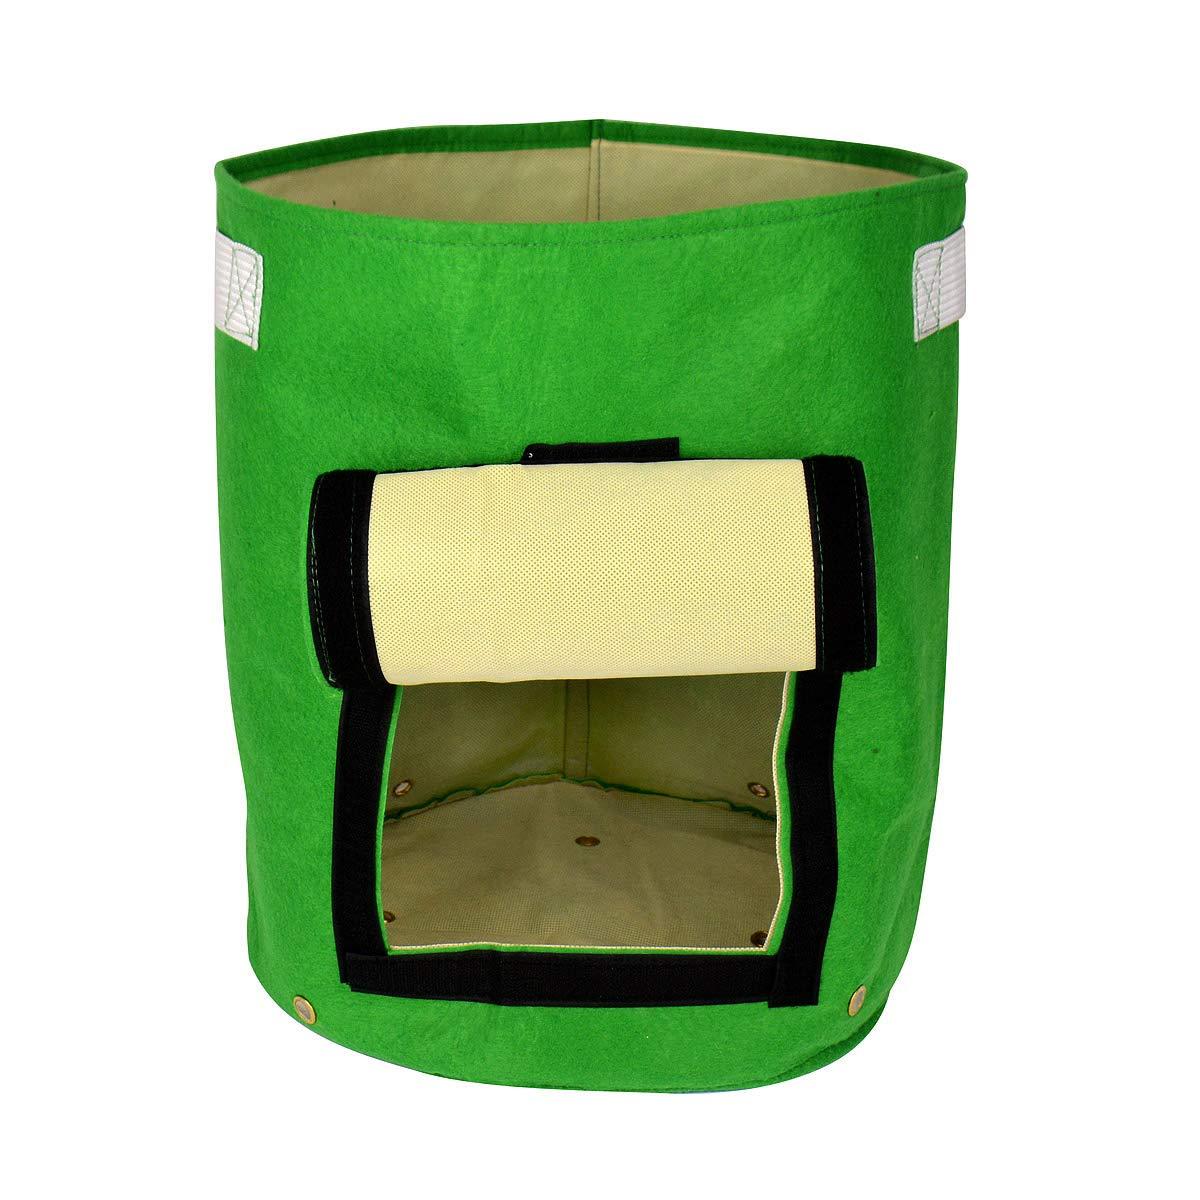 Daul Layer Non-Woven Fabrics Potato Tub Grow Potatoes Patio Recycled Growing Bag Gardeningwill AHGRD000255